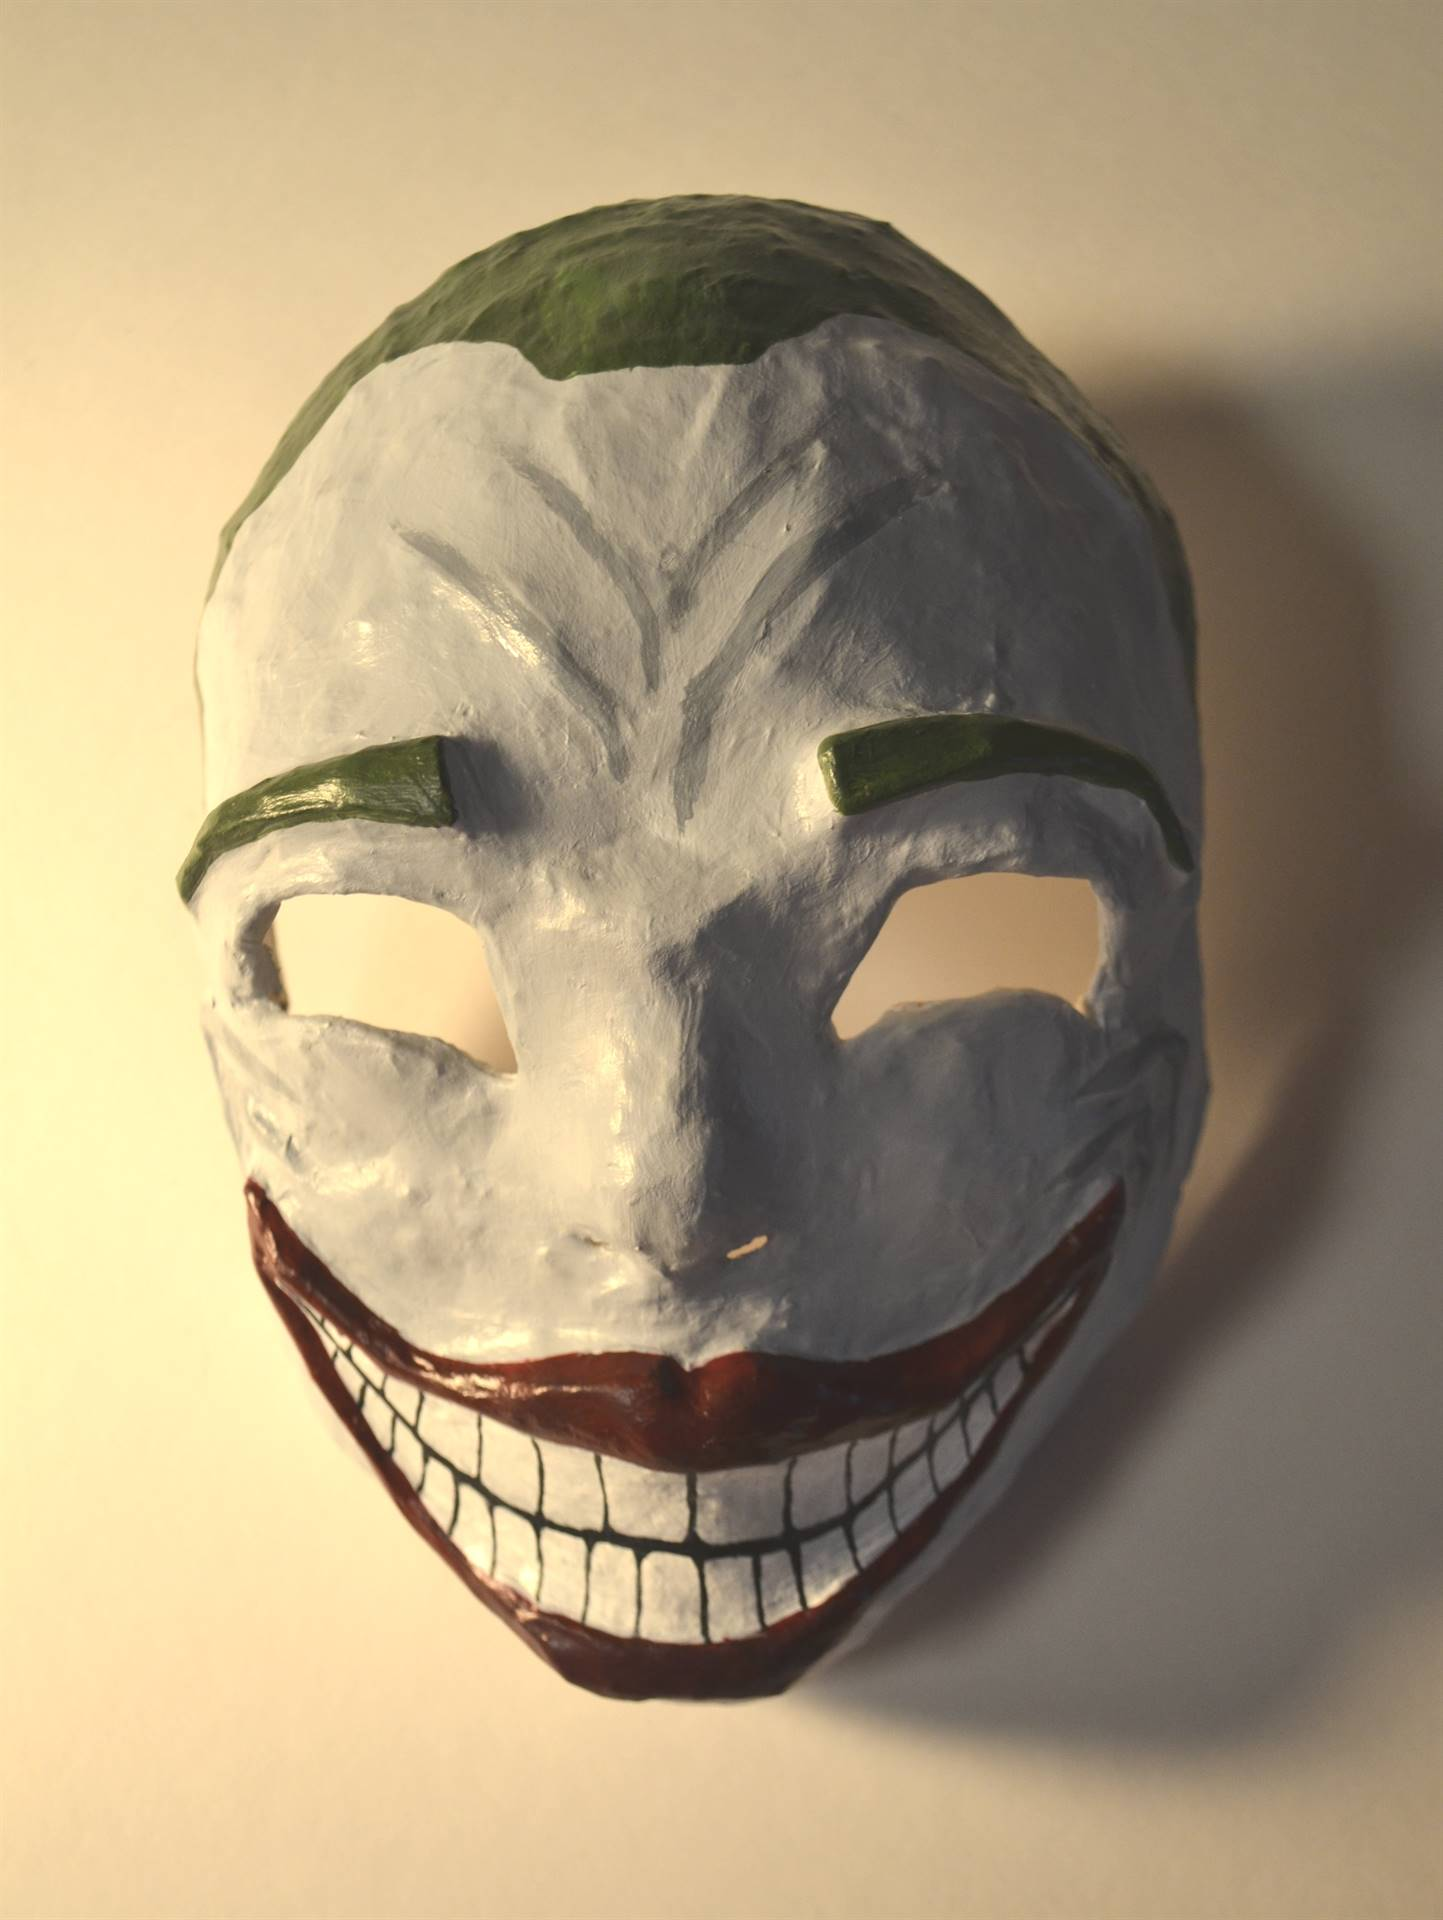 Kaylie Bowers, Joker with a Twist, multi-media mask, 2016